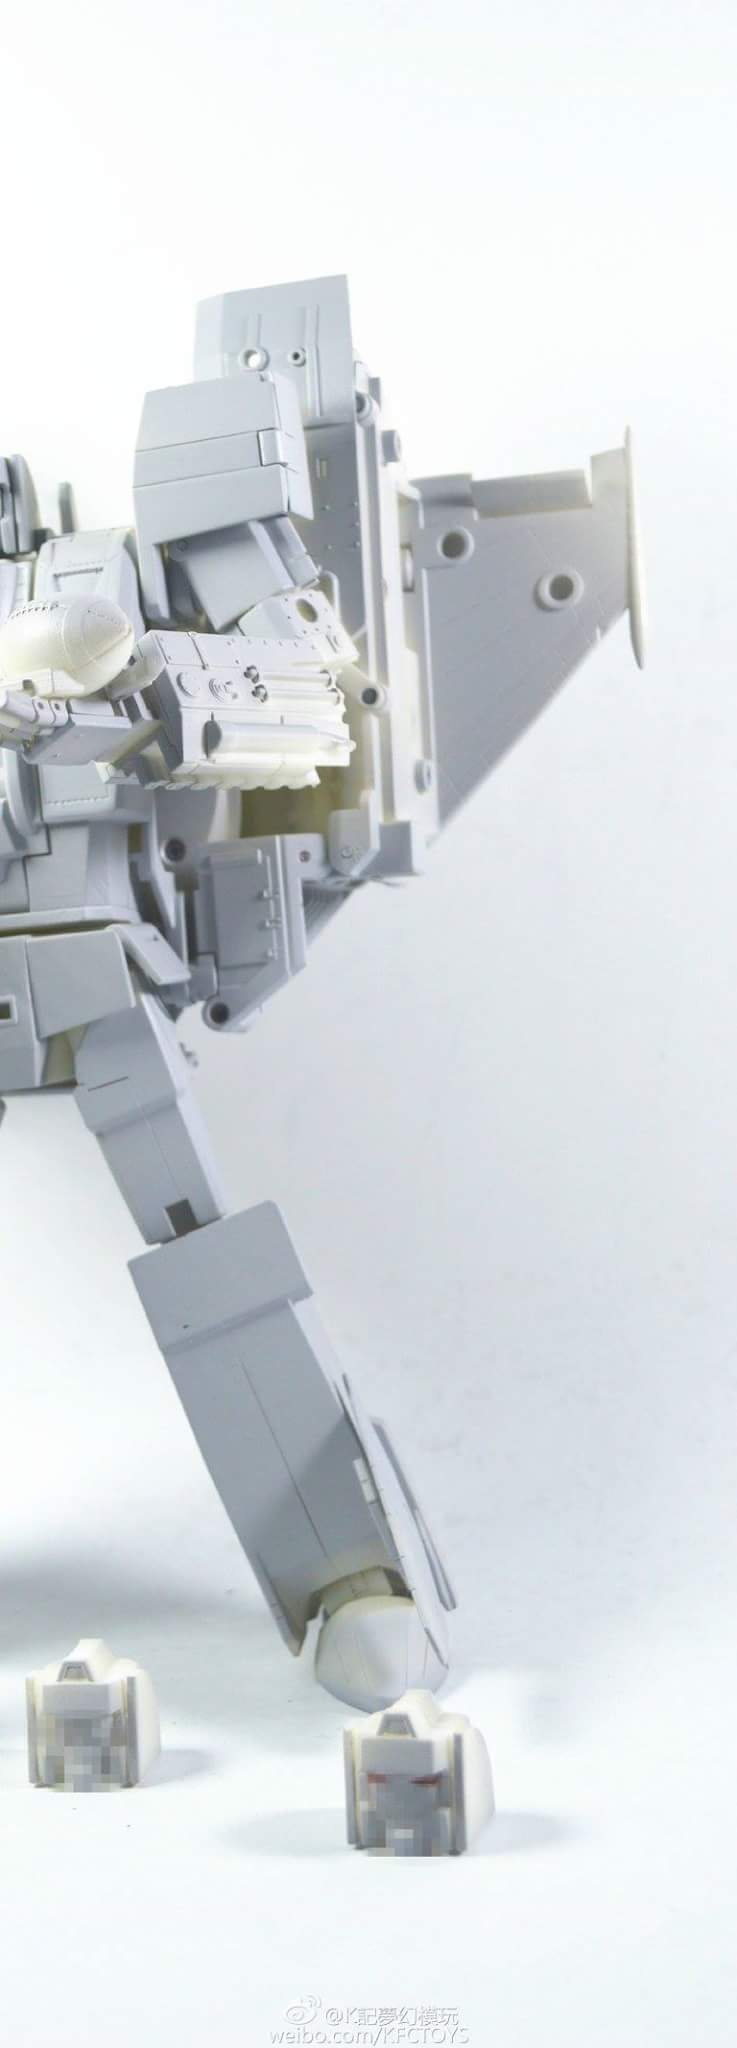 [KFC Toys] Produit Tiers - Jouet Phase 7-A Ditka - aka Blitzwing/Le Blitz Uk0vKrm1